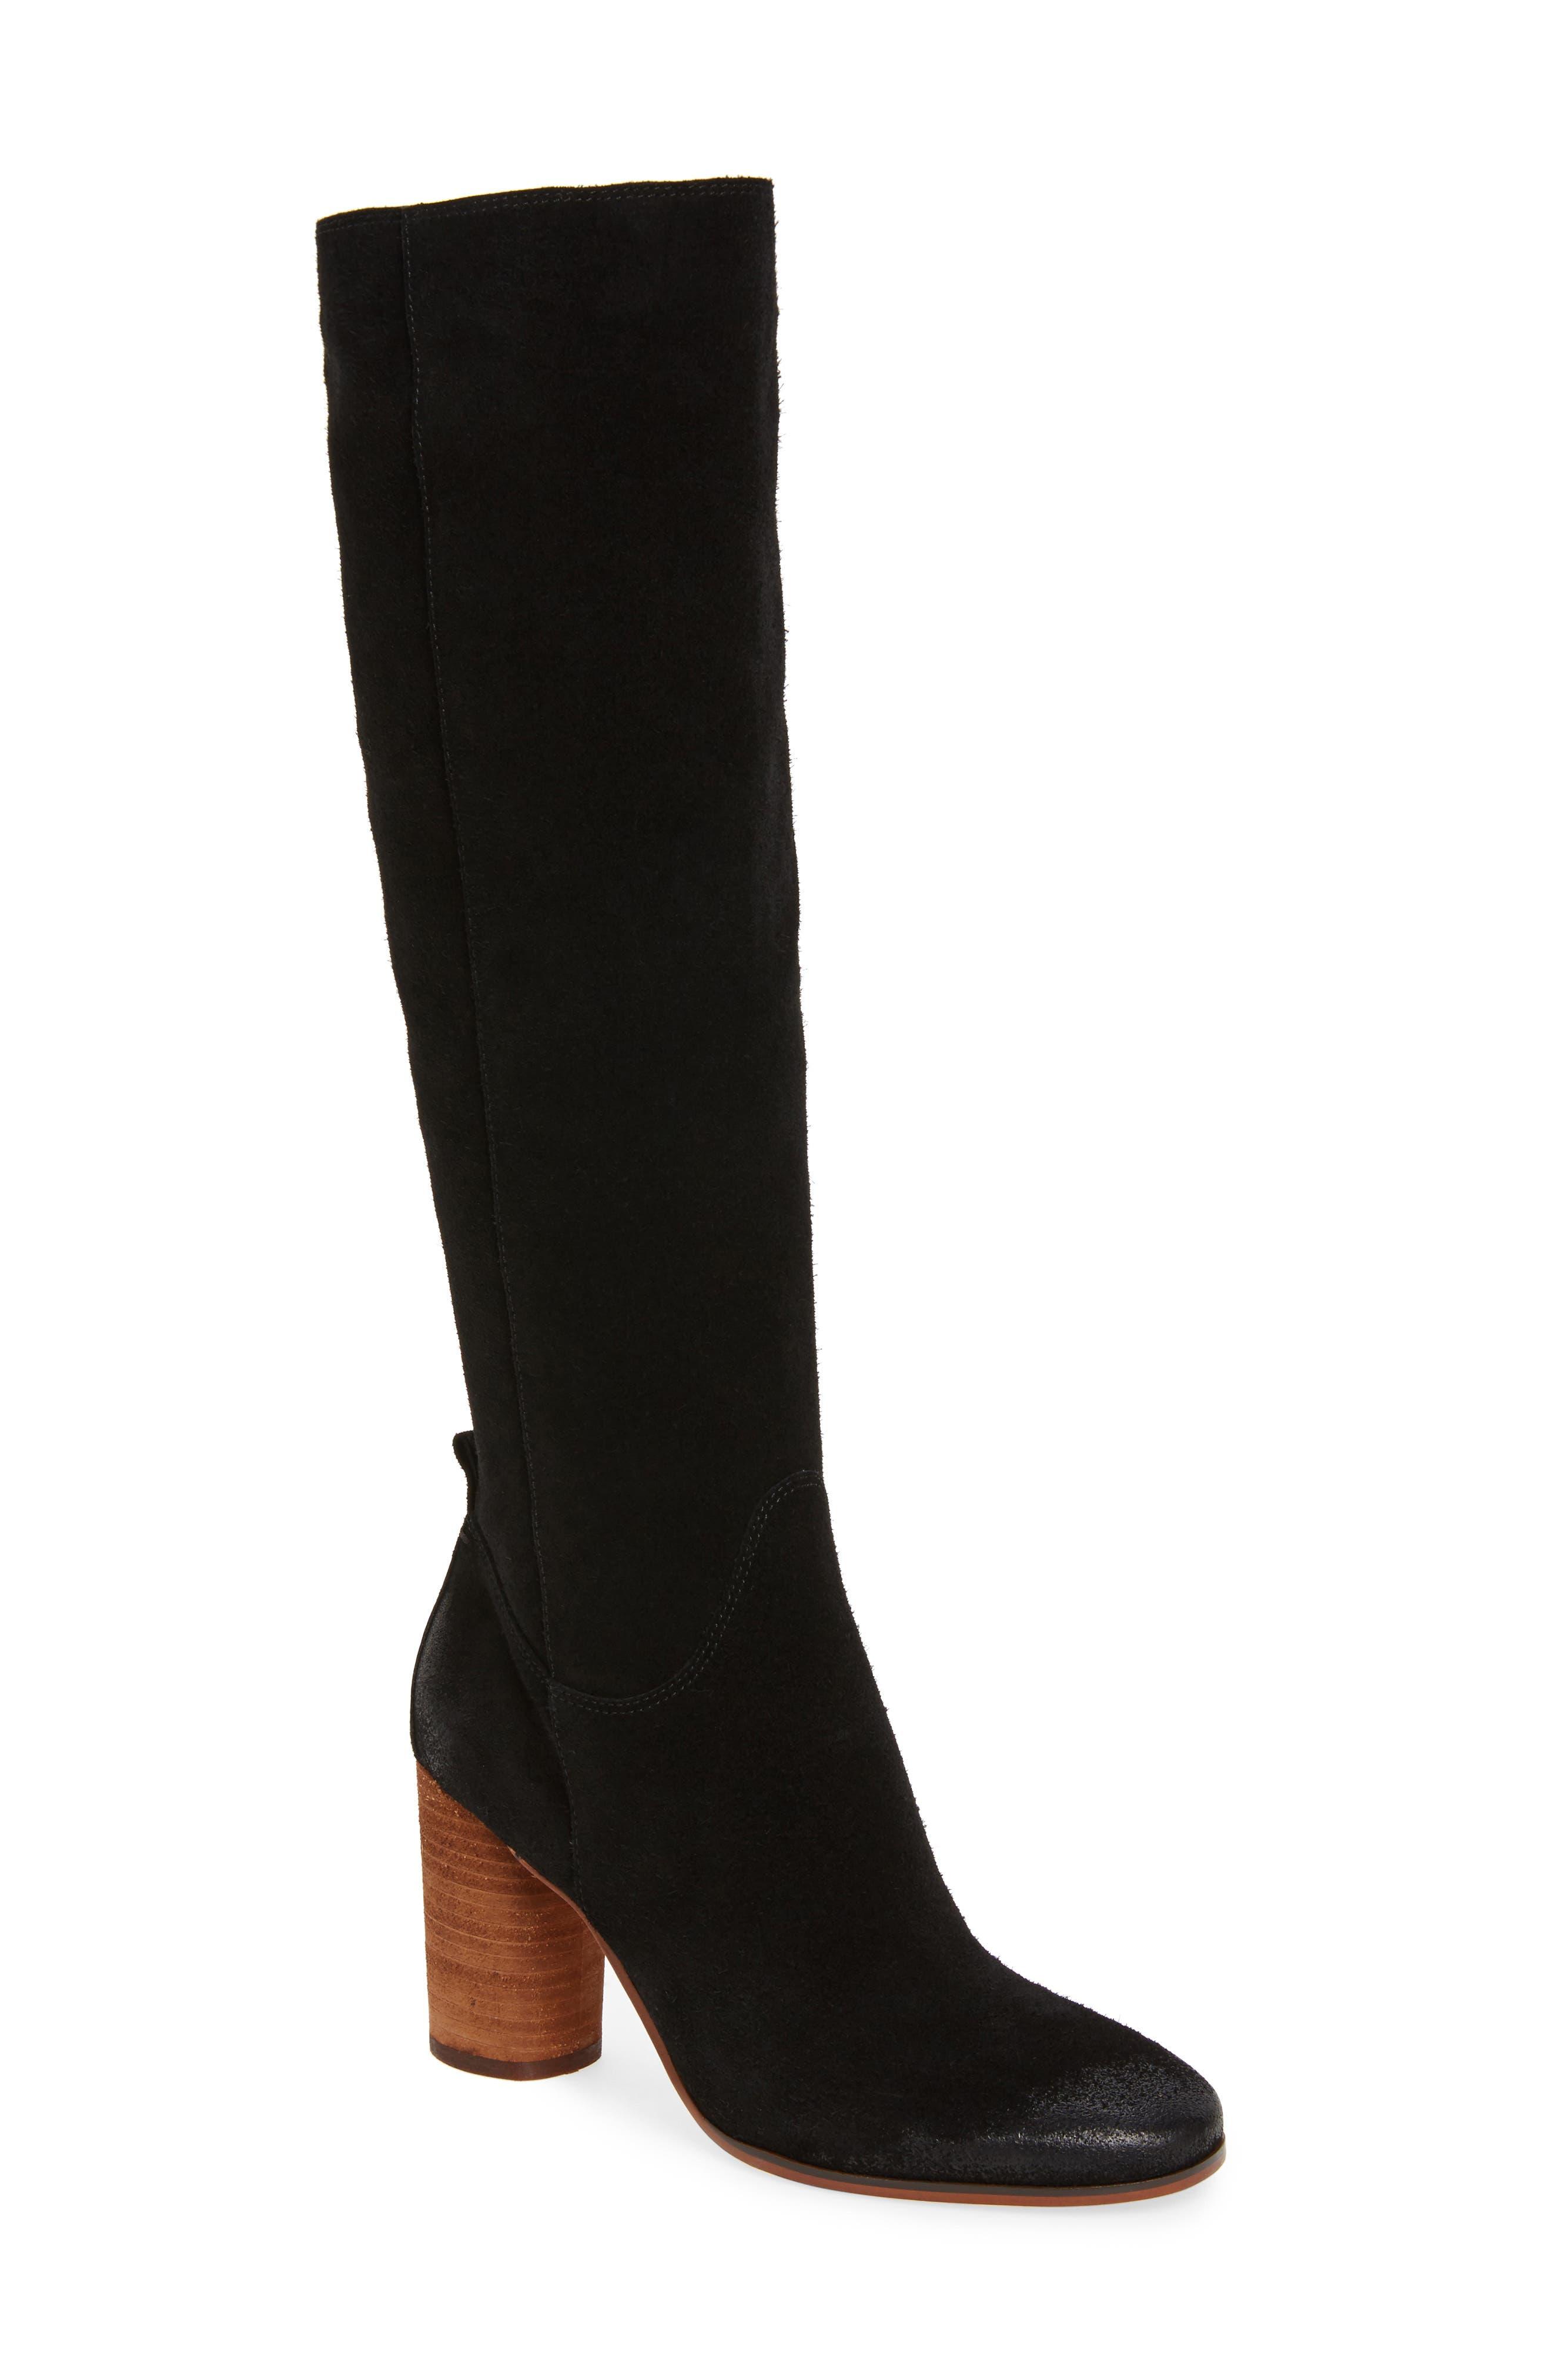 Main Image - Sam Edelman Camellia Tall Boot (Women)